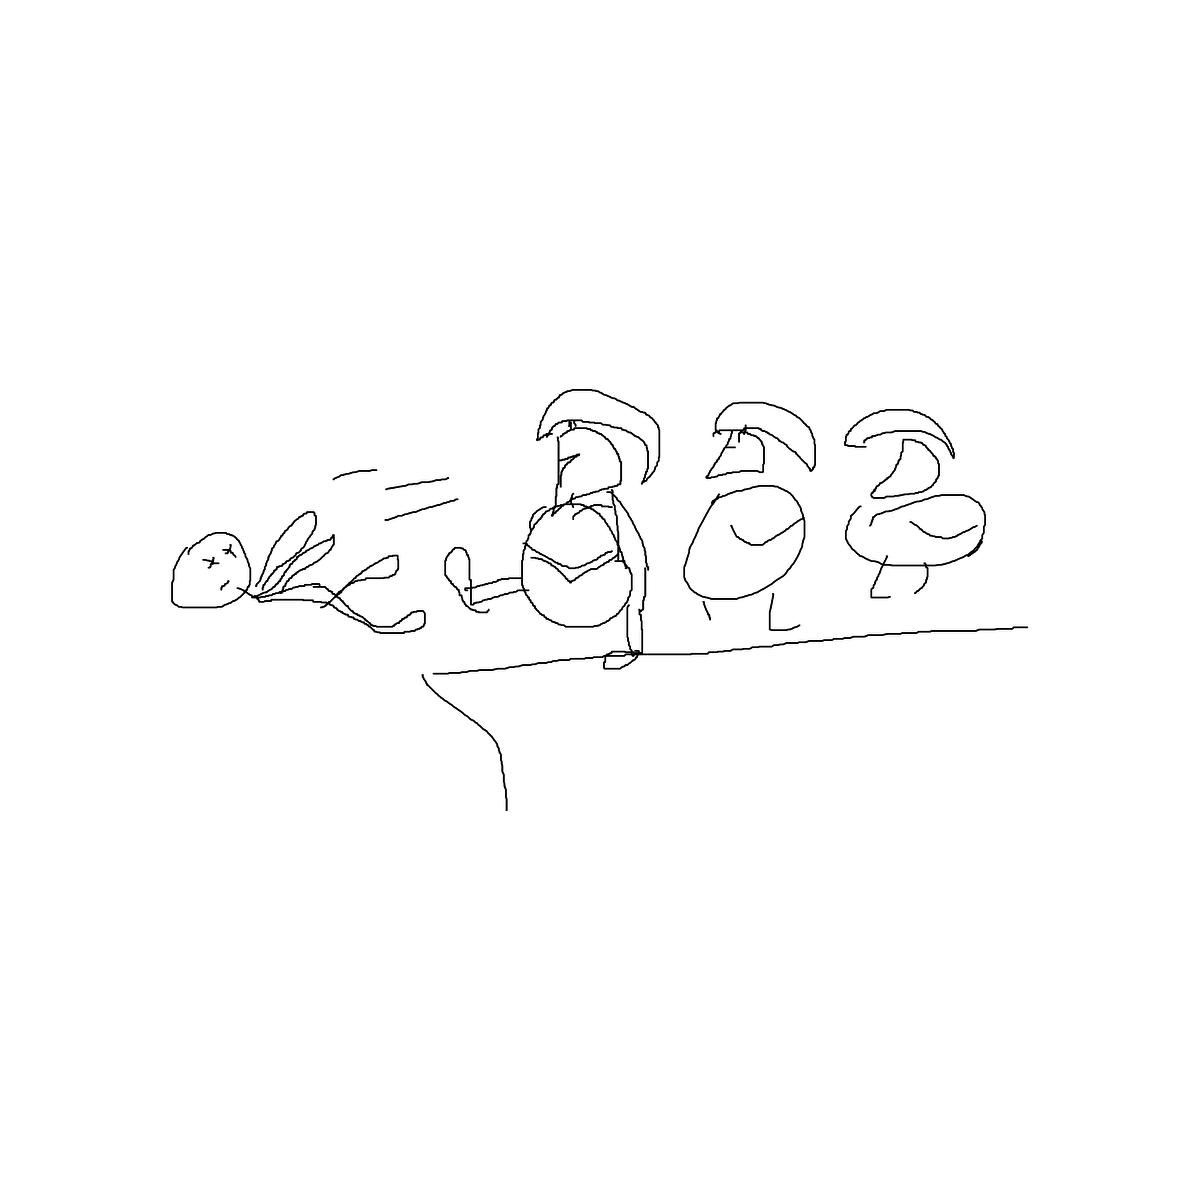 BAAAM drawing#8034 lat:38.8192558288574200lng: 22.6315364837646500